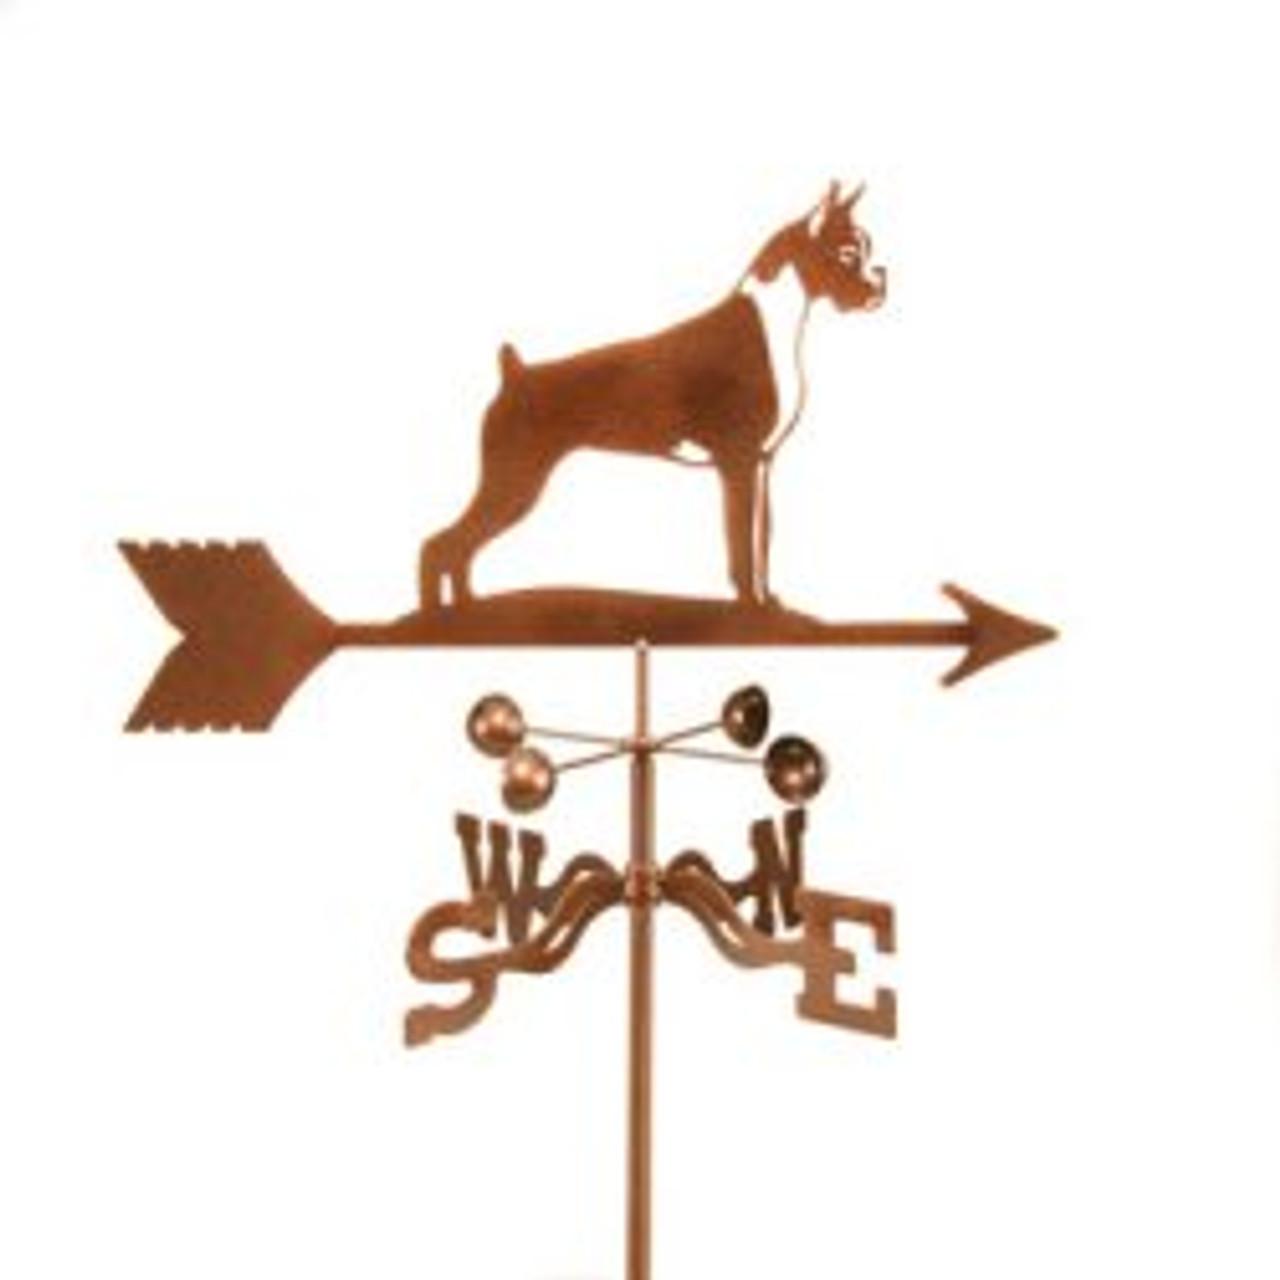 Dog-Boxer  Weathervane with mount